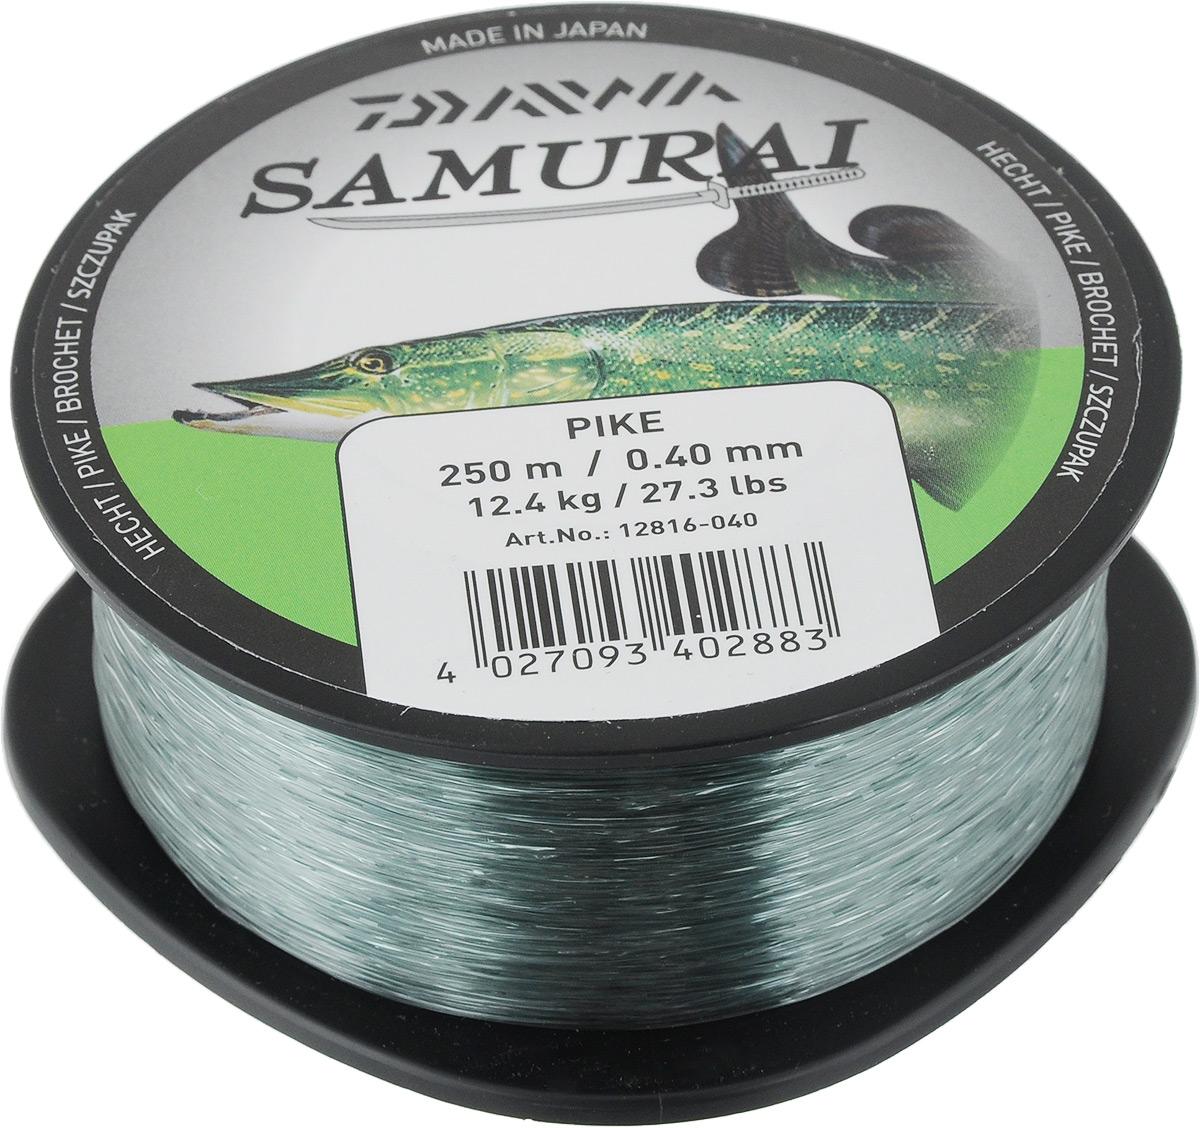 Леска Daiwa Samurai Pike, цвет: светло-оливковый, 250 м, 0,4 мм, 12,4 кг леска daiwa samurai pike цвет светло оливковый 350 м 0 35 мм 10 1 кг